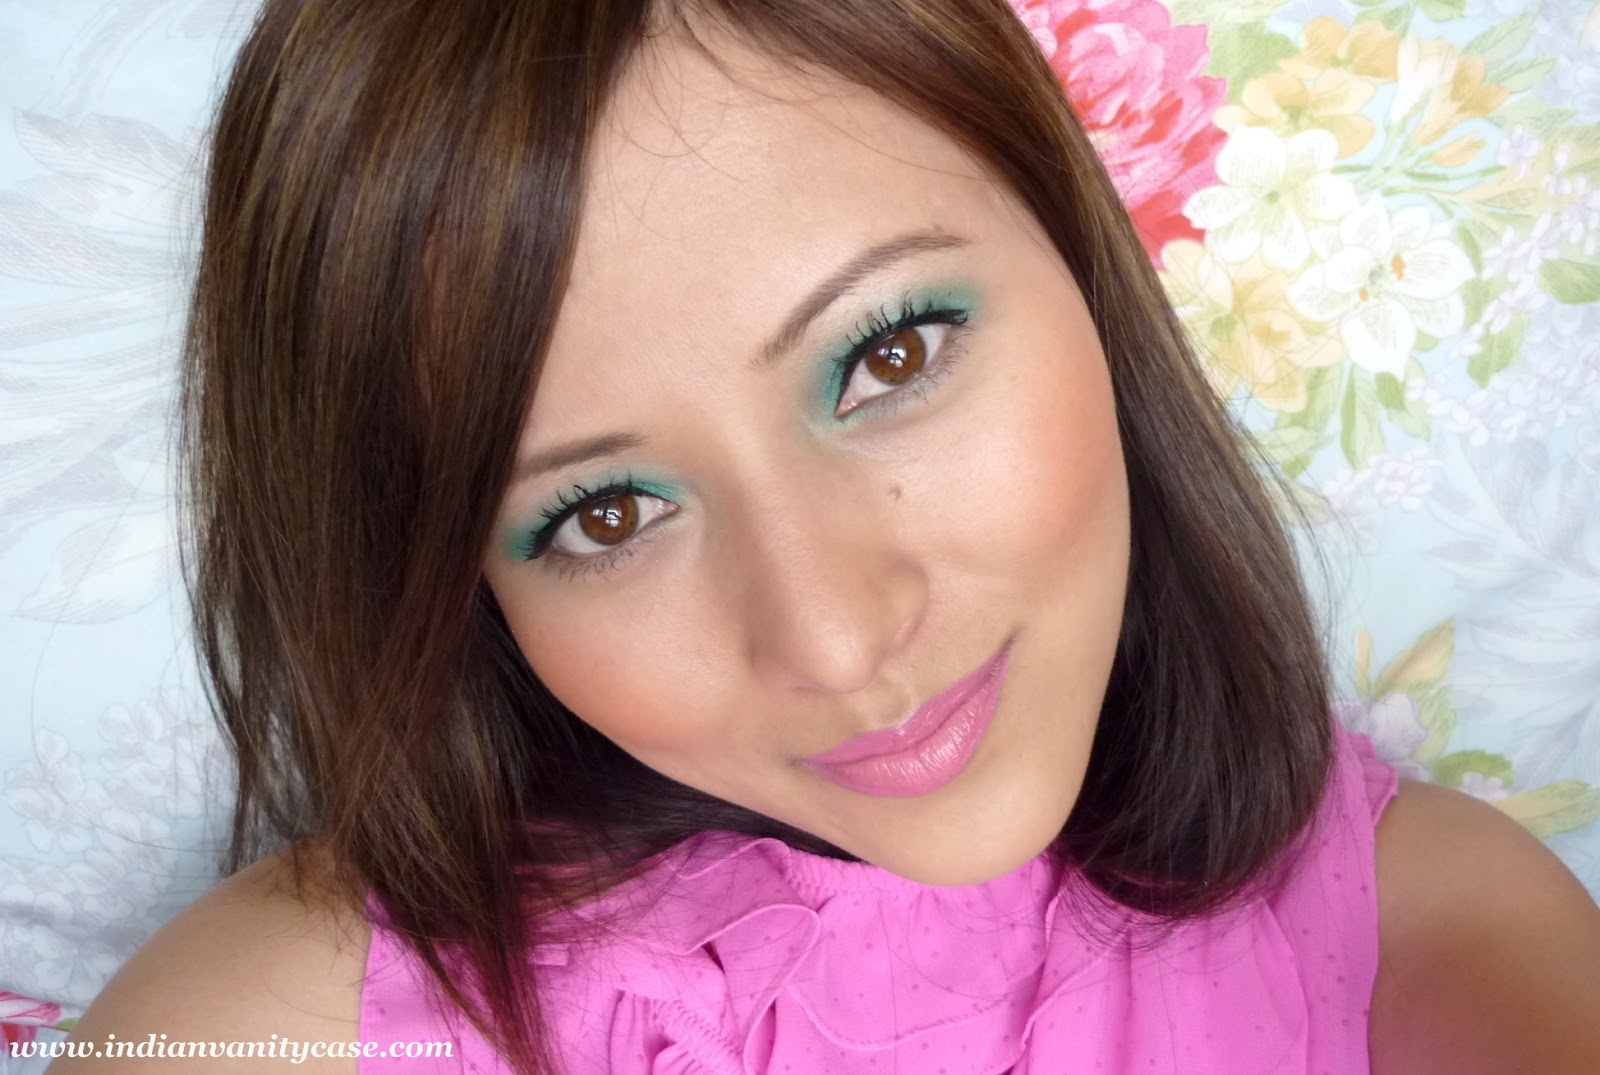 http://3.bp.blogspot.com/-JEcxriJ0JZM/TaRBVDSJ-yI/AAAAAAAAE4U/_-gVMUiUOxM/s1600/color%2525252Bblock%2525252Bmakeup.jpg